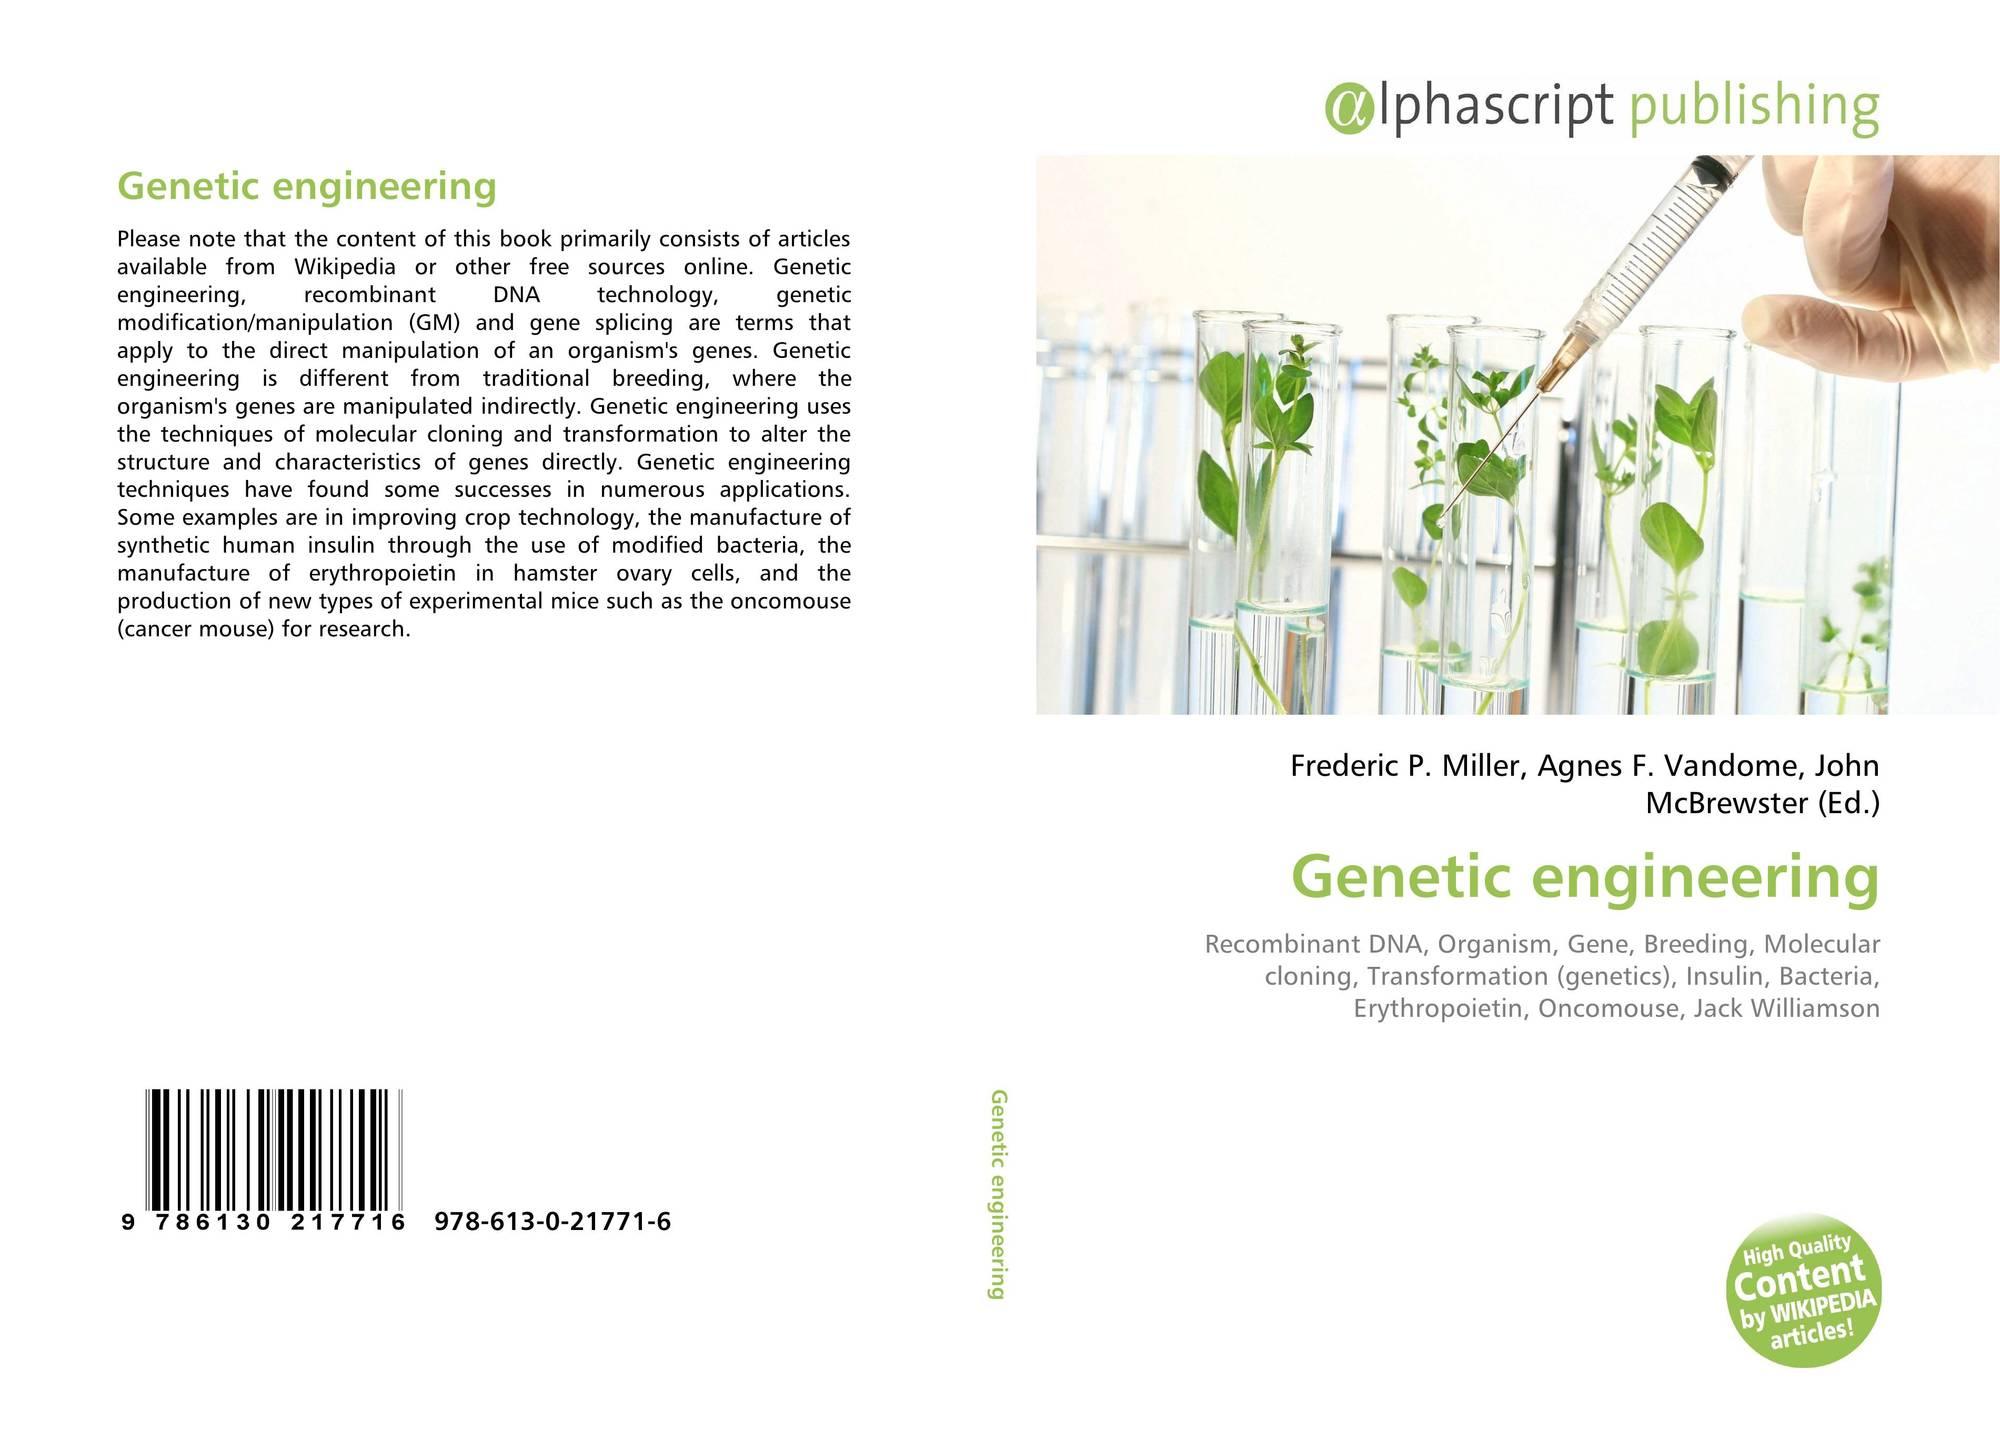 Genetic engineering wikipedia - Bookcover Of Genetic Engineering